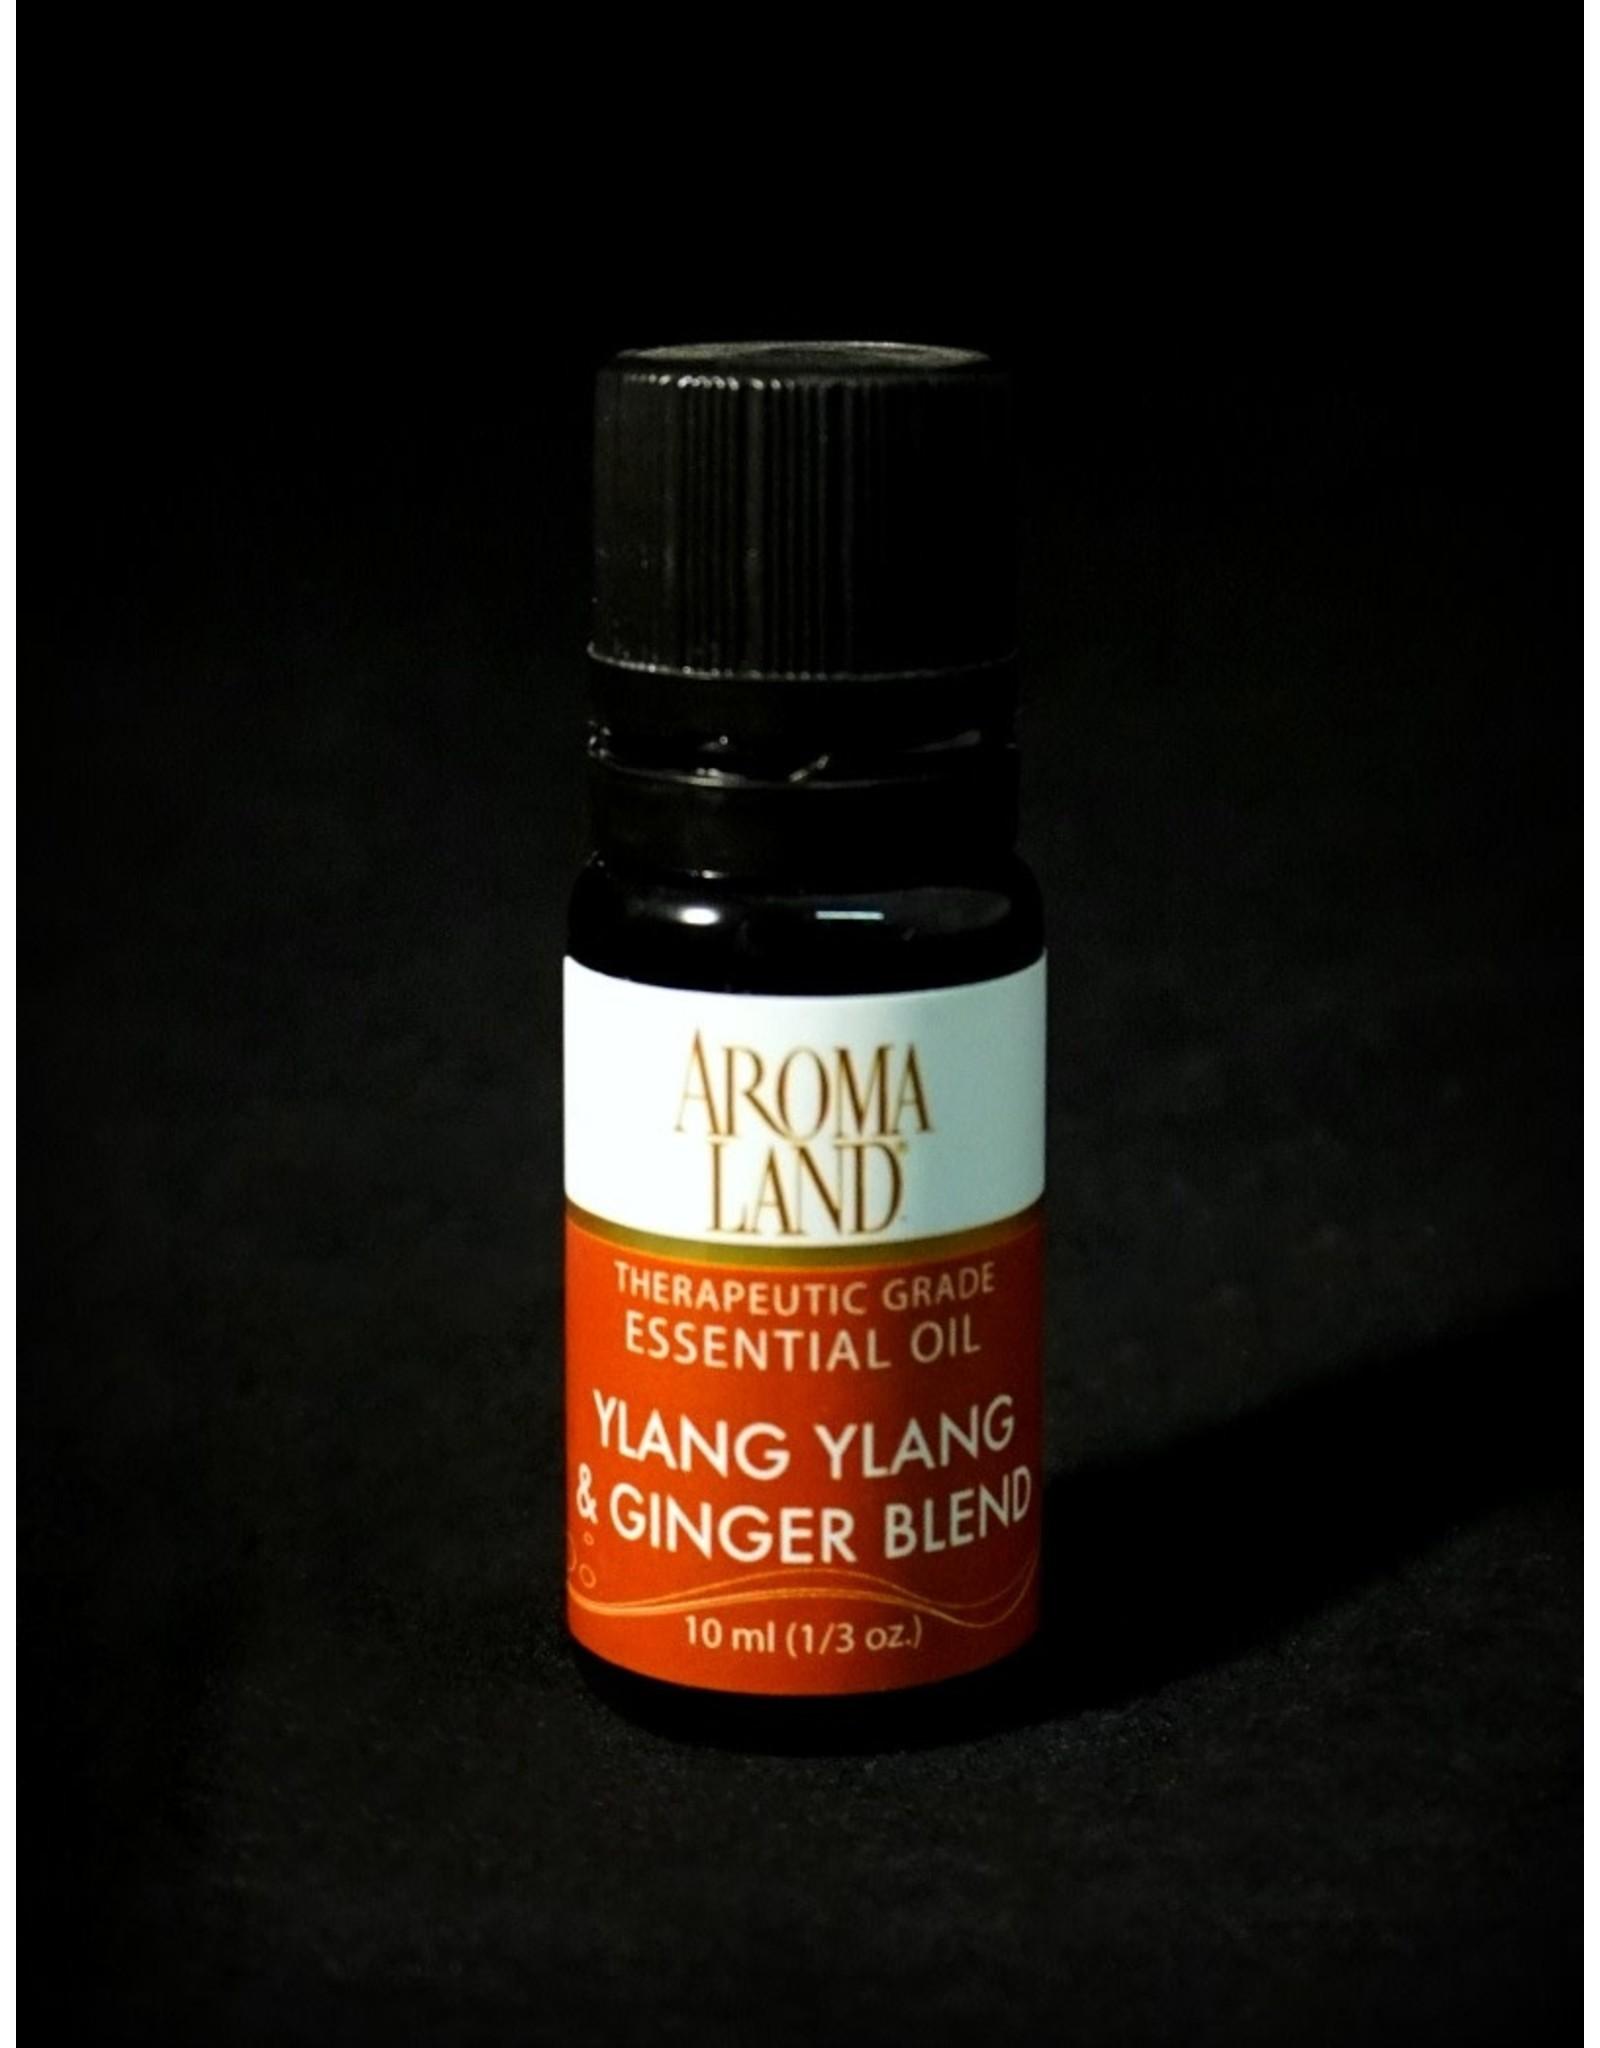 Aromaland Essential Oil - Ylang Ylang